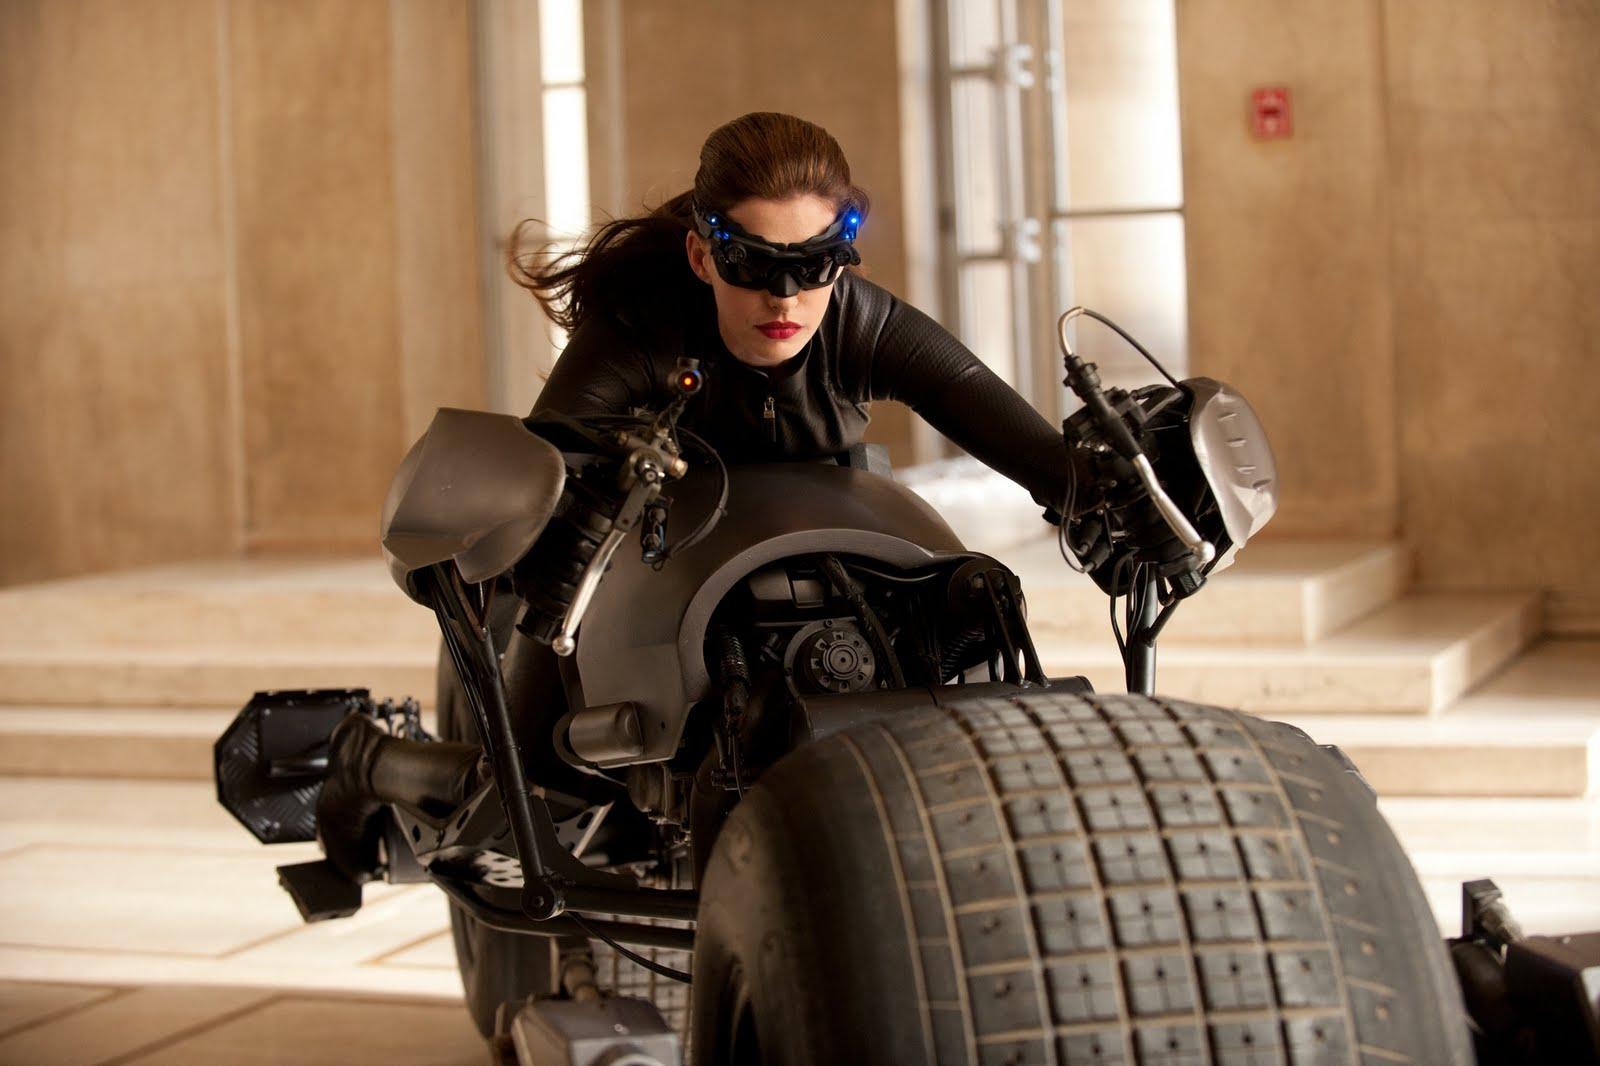 http://3.bp.blogspot.com/-93x60hWa_WM/TjuwMwEirGI/AAAAAAAABYA/thwW8SRiYqo/s1600/official-anne-hathaways-catwoman-batman-movie-dark-knight-rises-costume.jpg